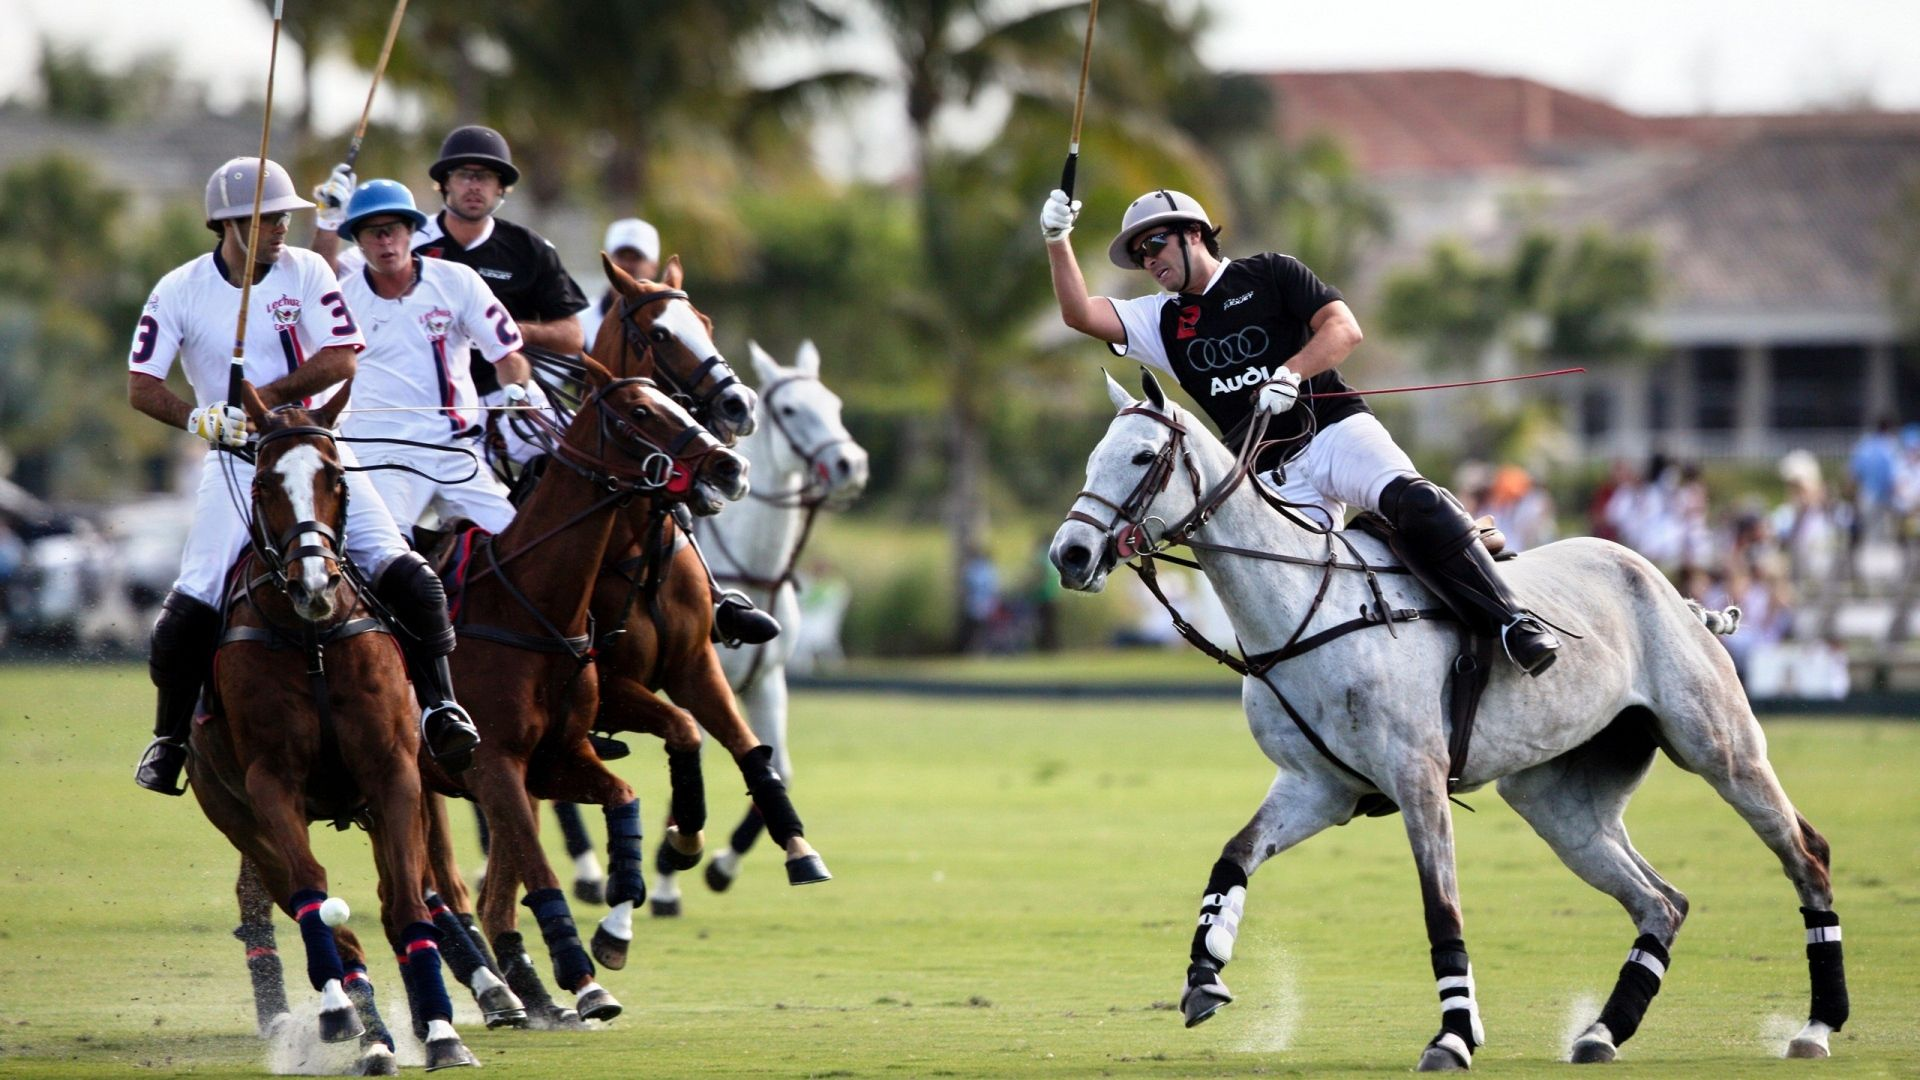 Download wallpaper 1920x1080 polo sportsmen blow horses